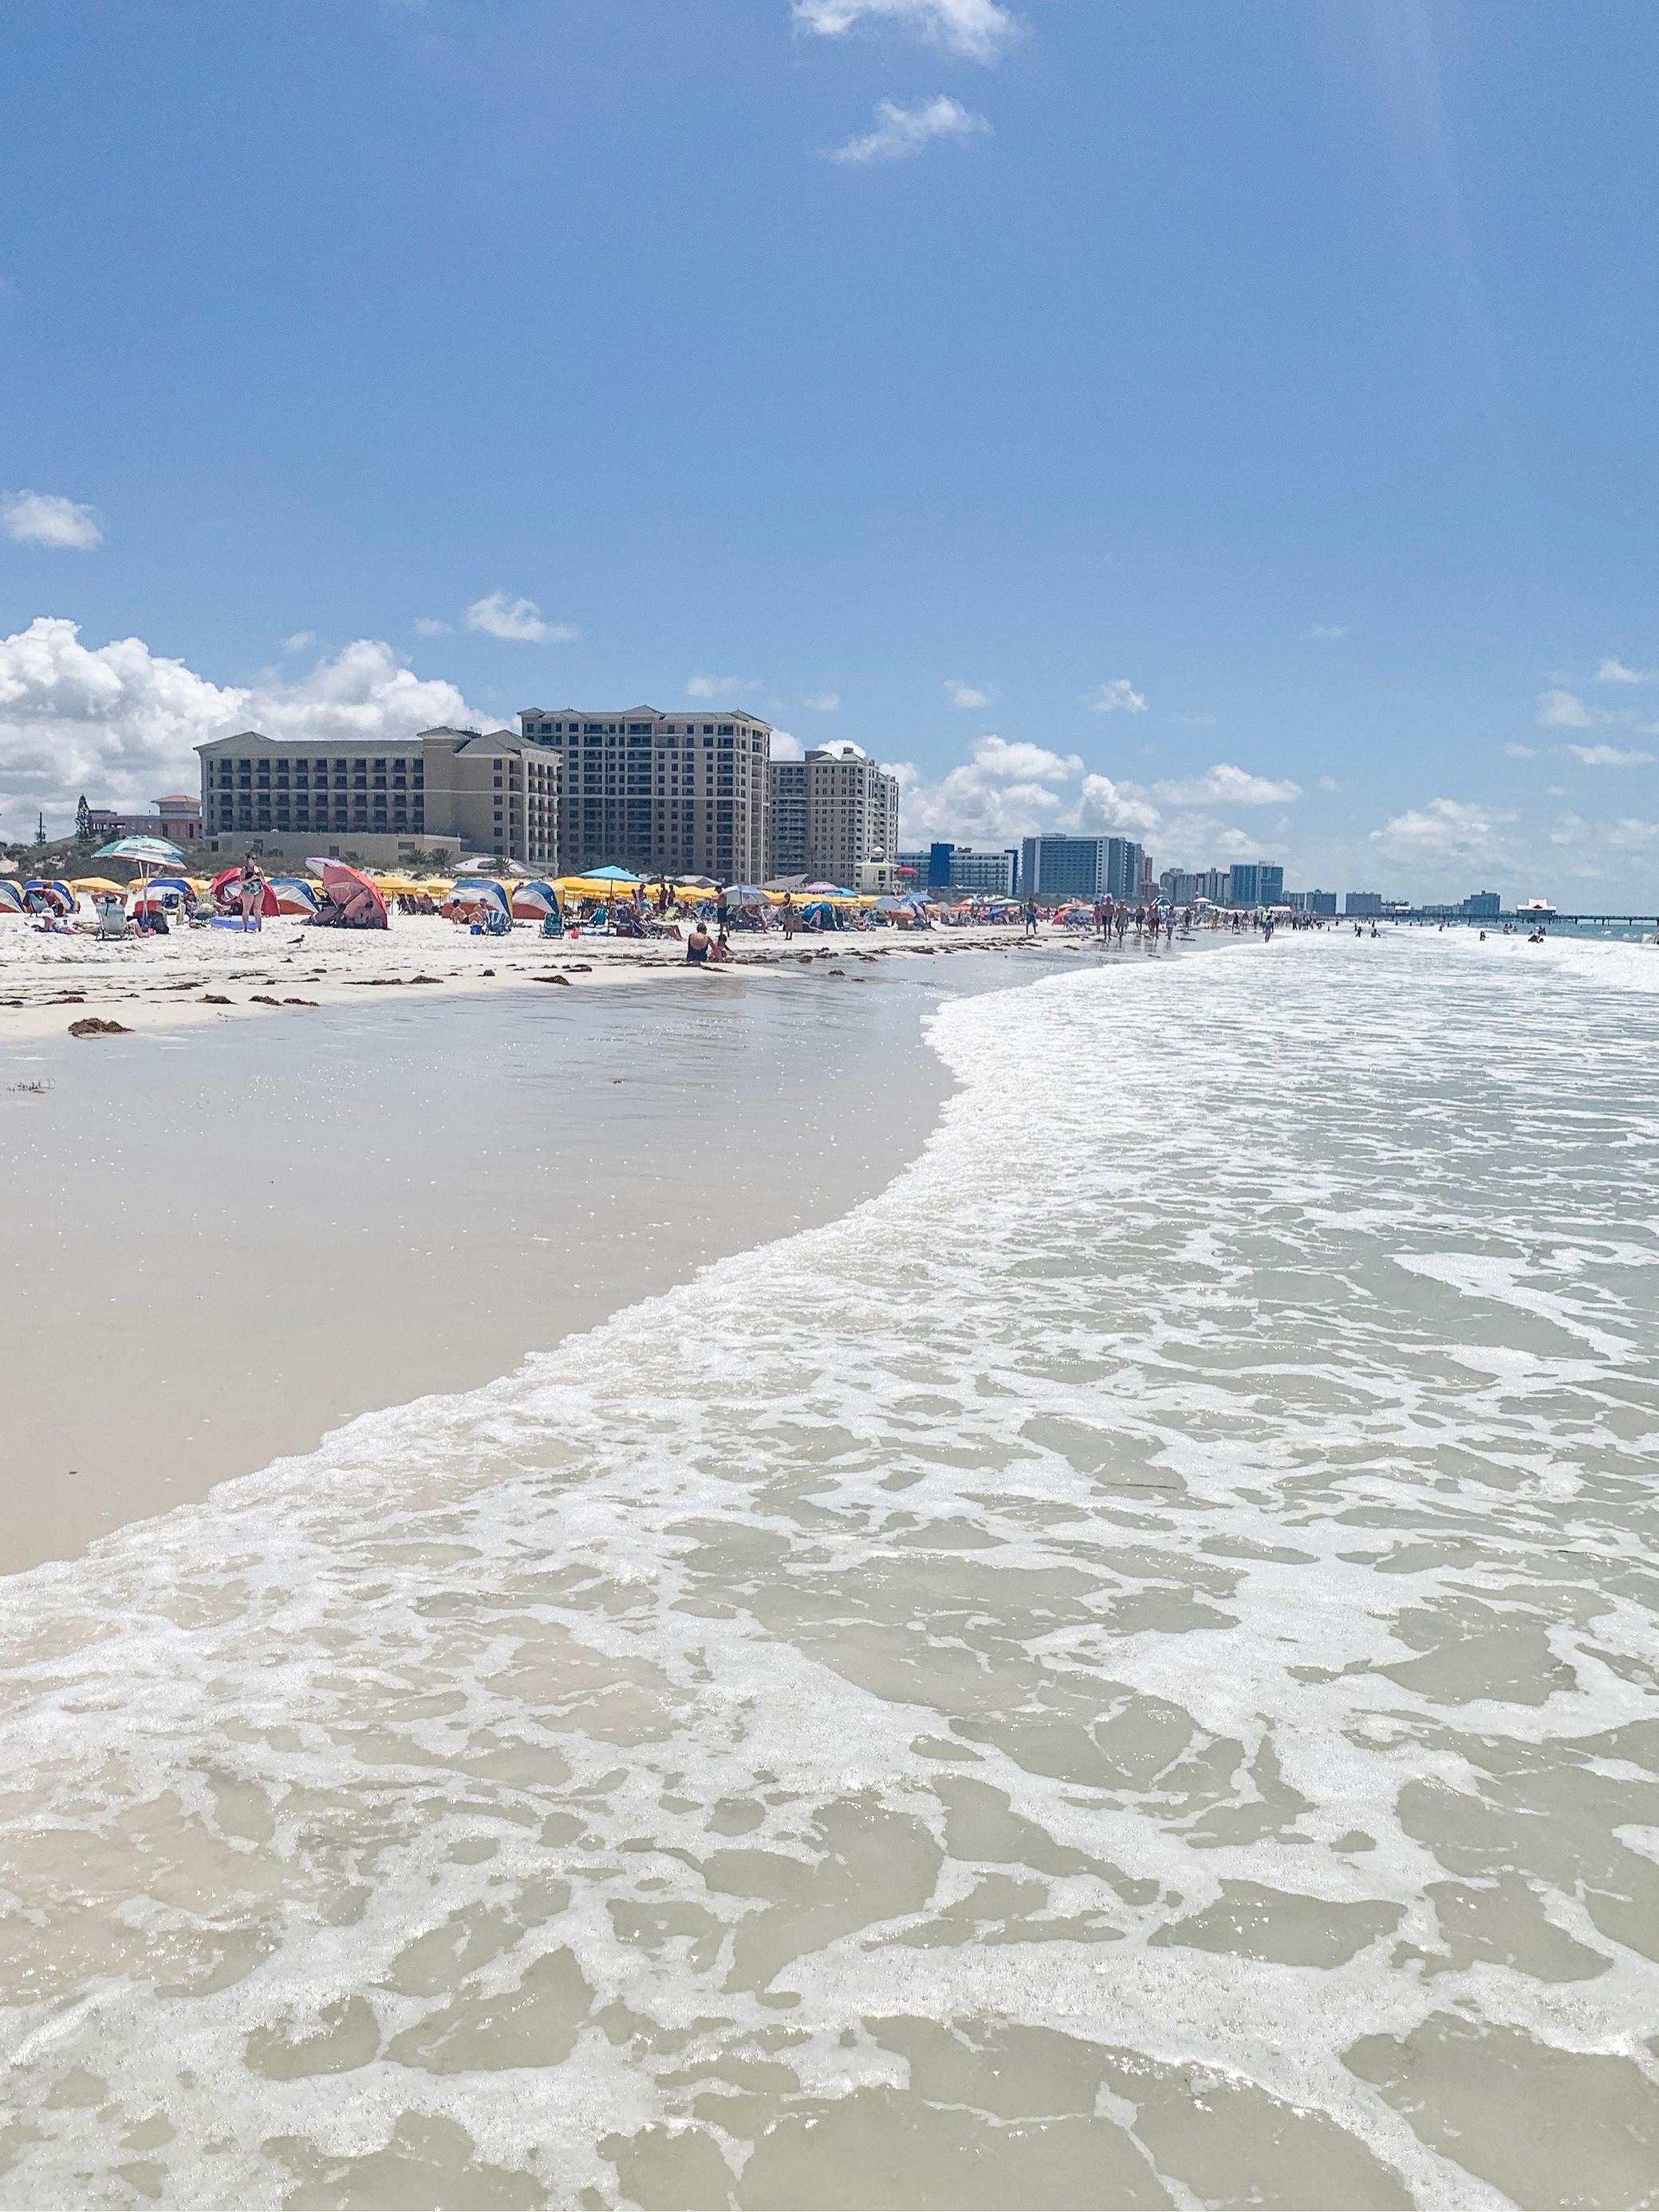 Dag 4 i Florida - Clearwater